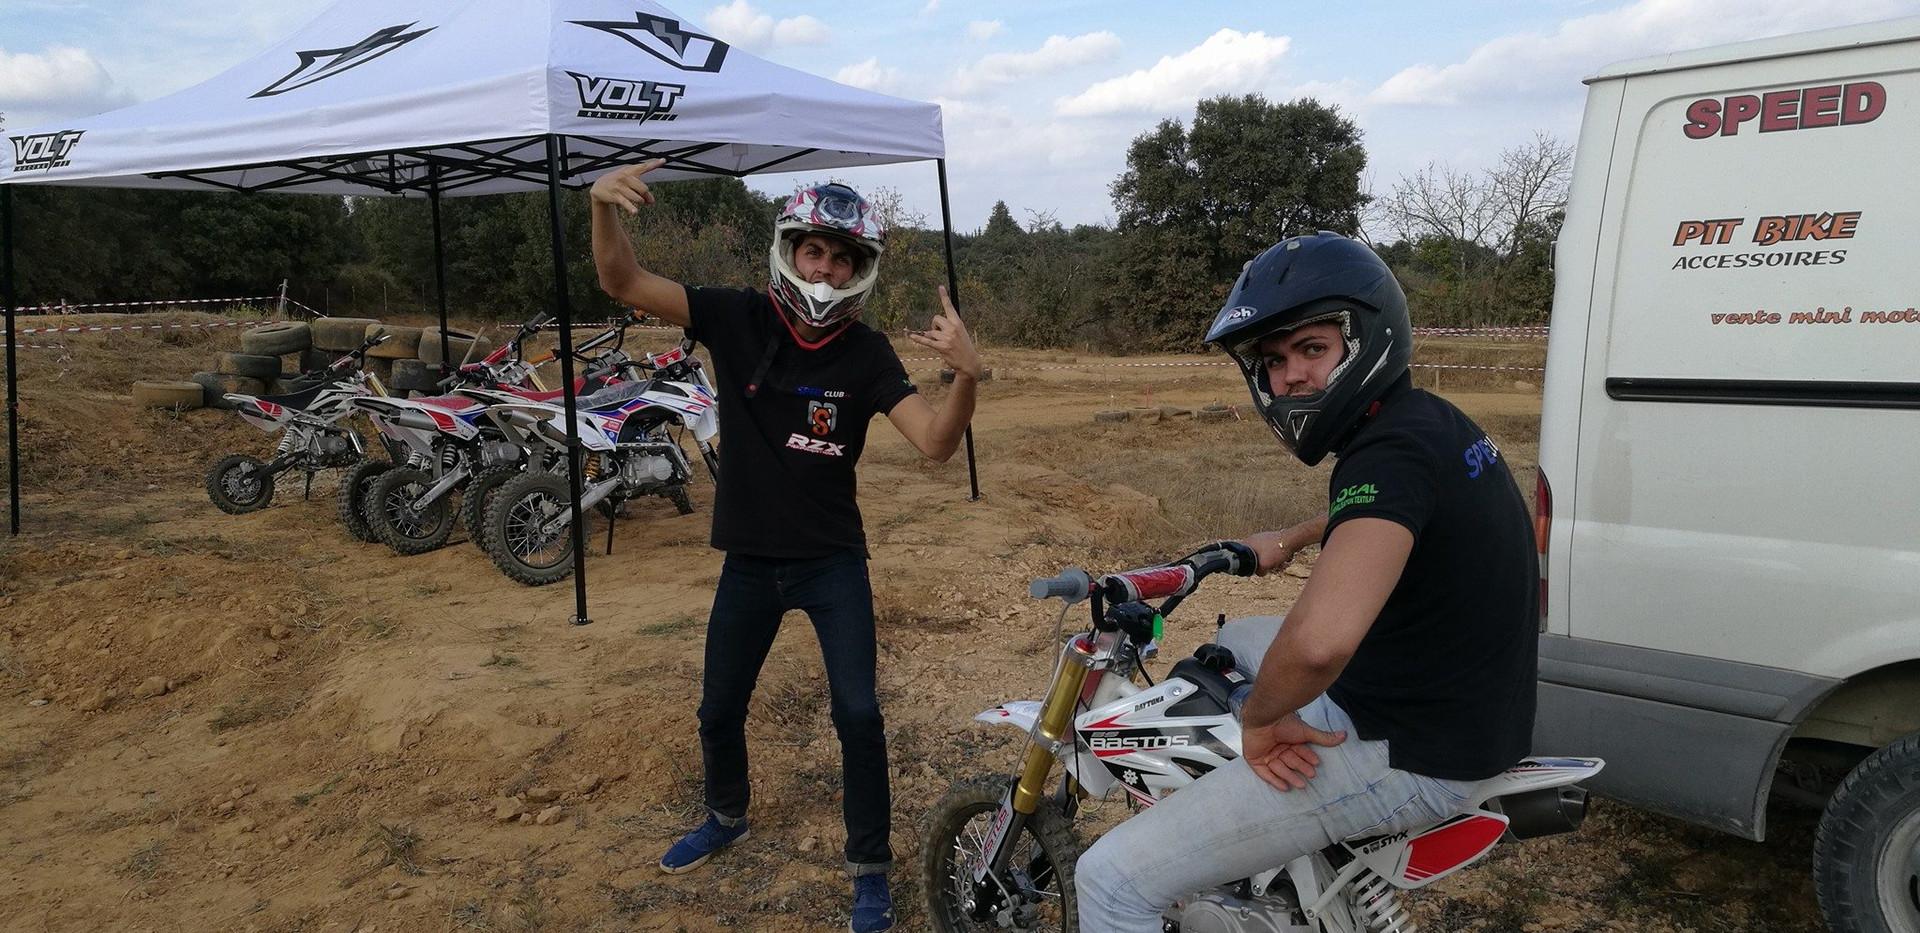 Aymeric et Francisco au speedclubtrack.j